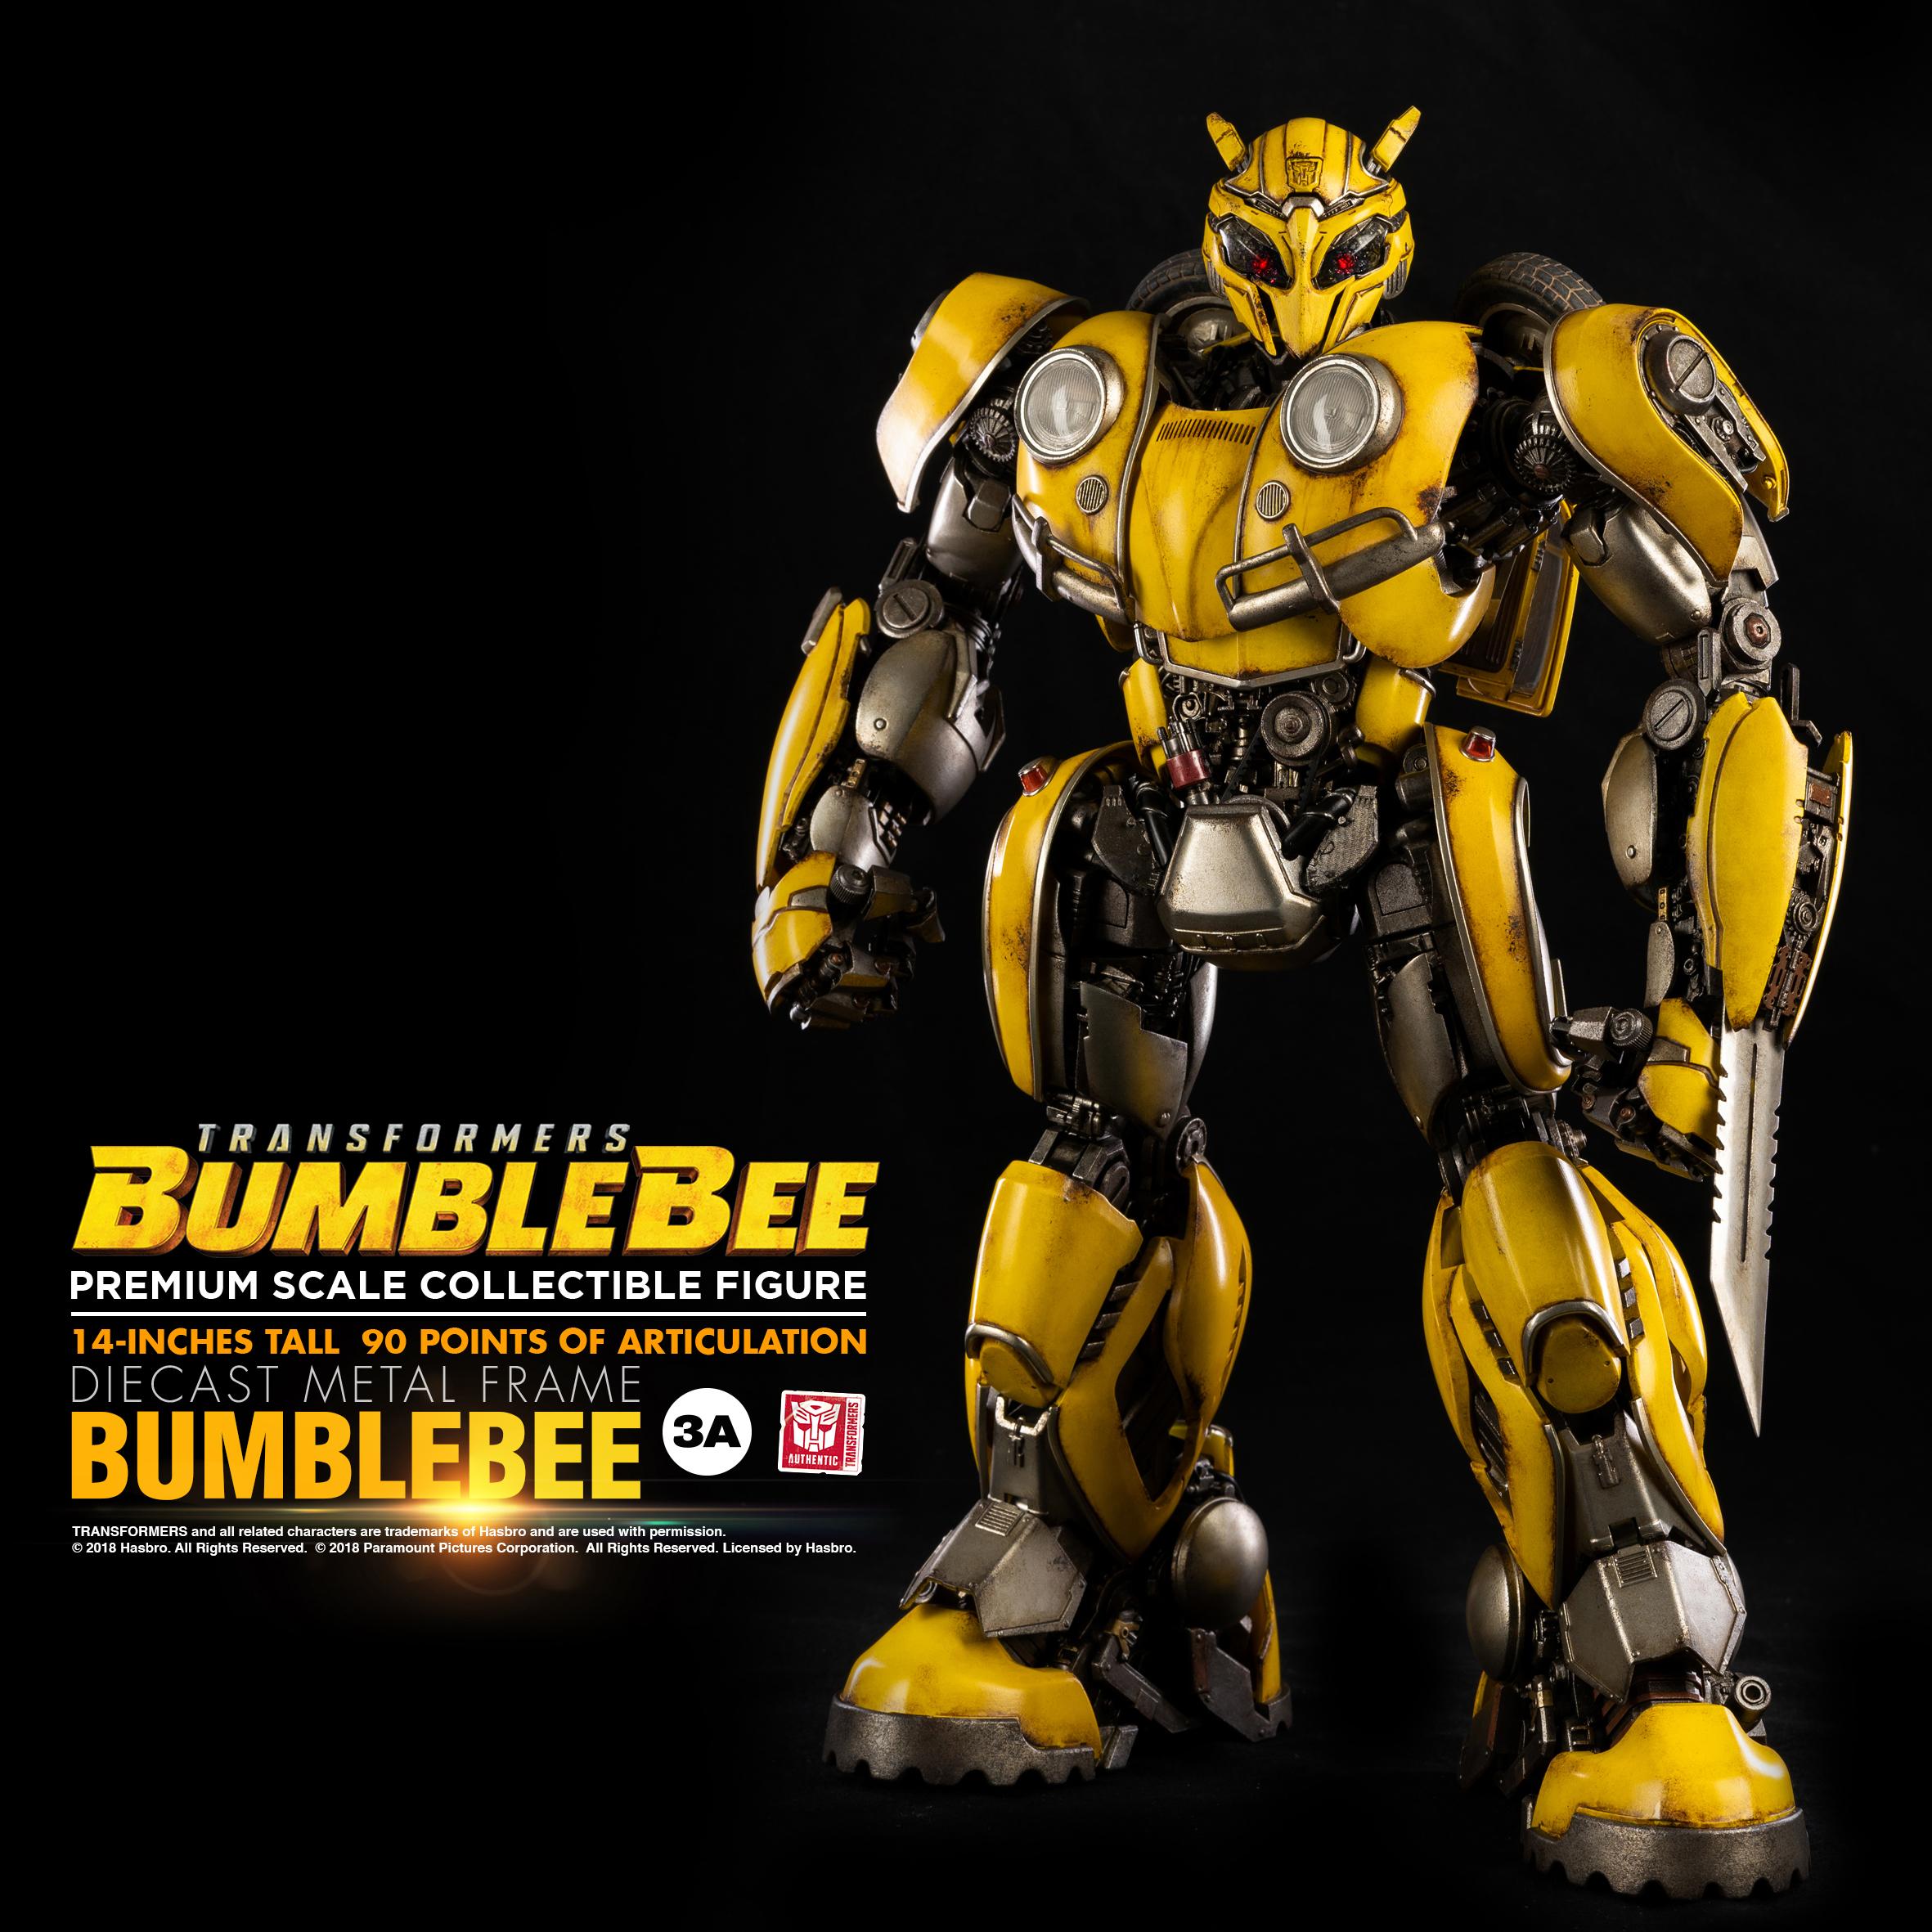 Bumblebee_ENG_PM_SQUARE_007.jpg